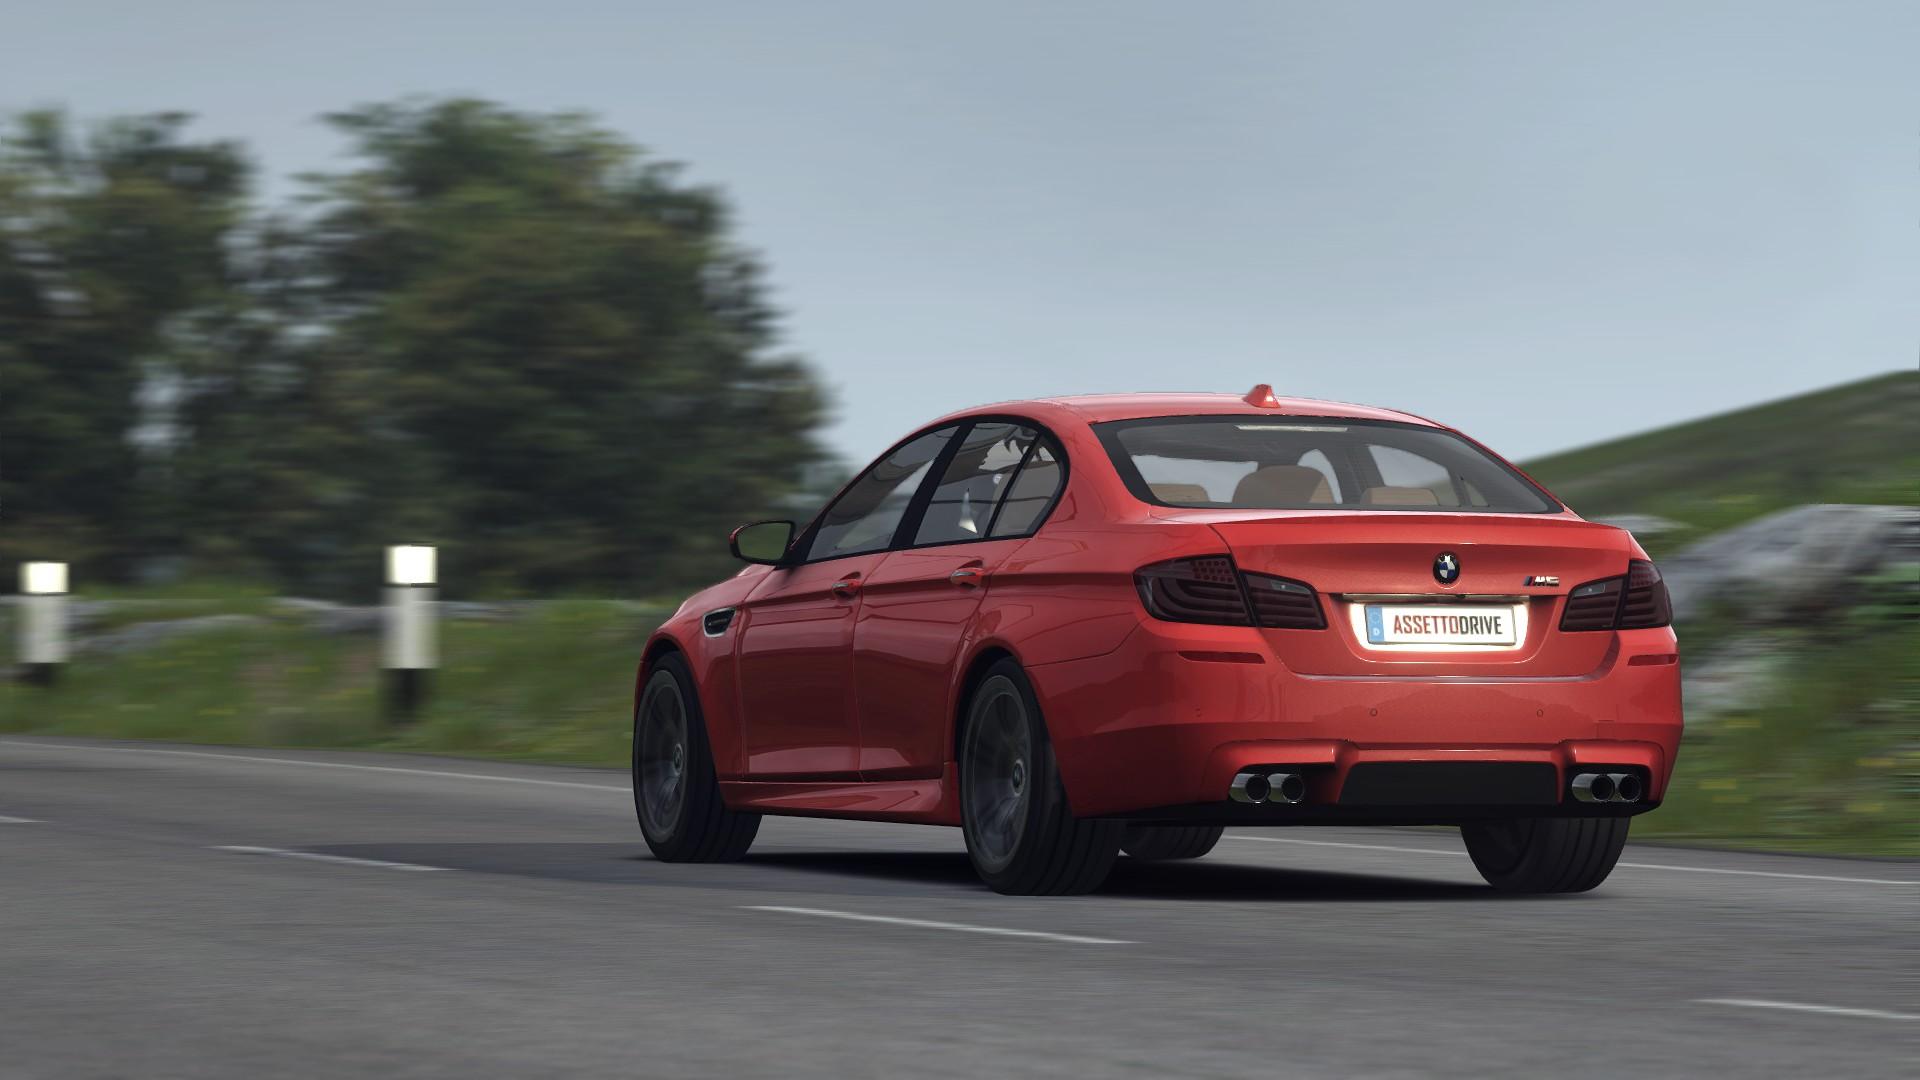 BMW M5 F10 Assetto Corsa 1.14 067.jpg